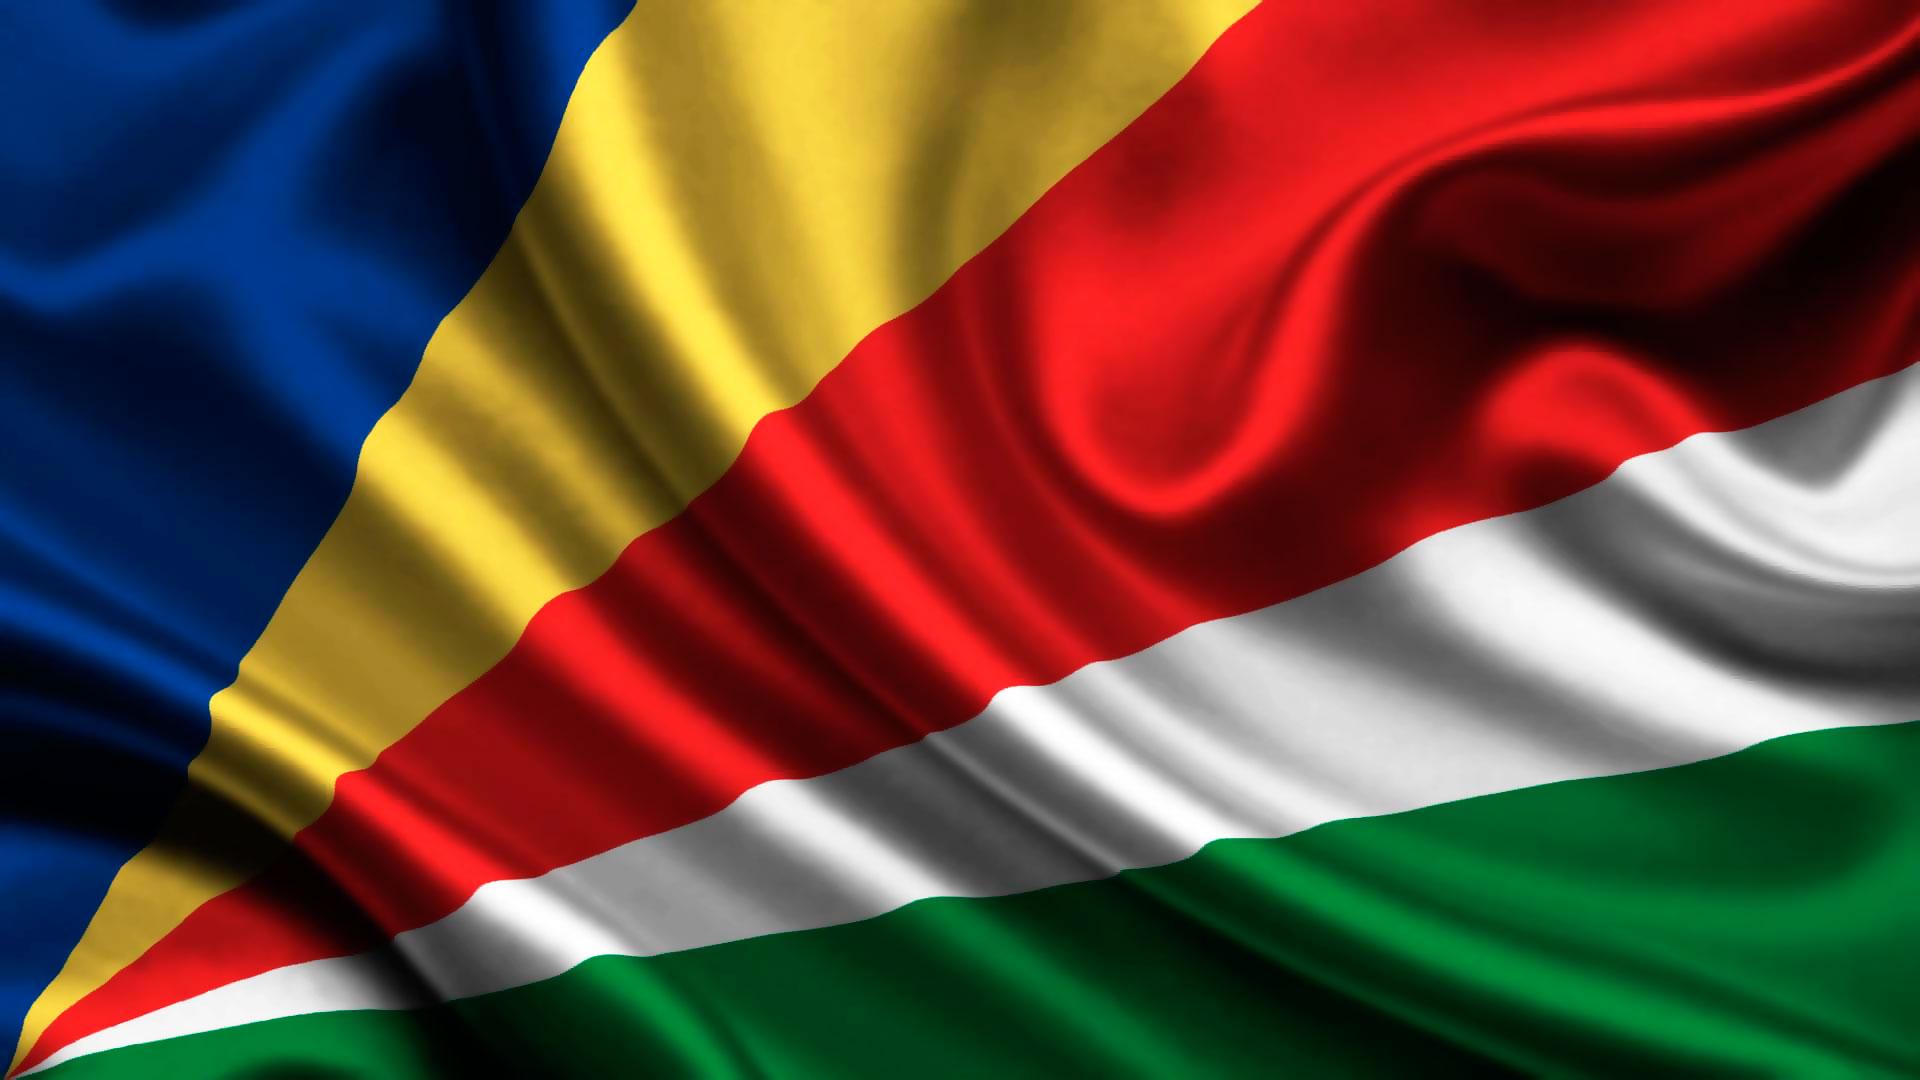 flag-seychelles